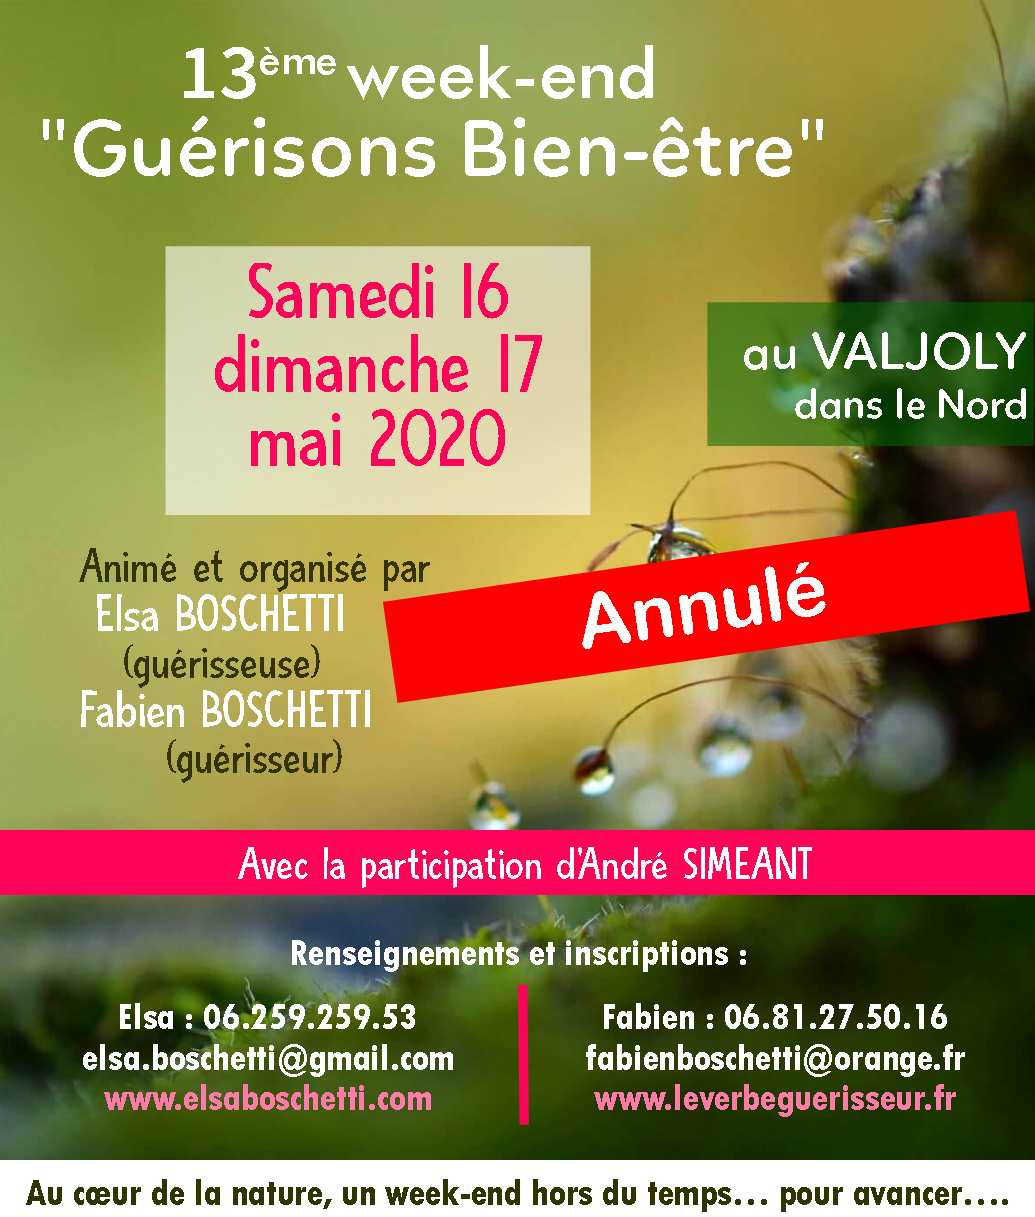 IM - Valjoly 2020 annulé.png